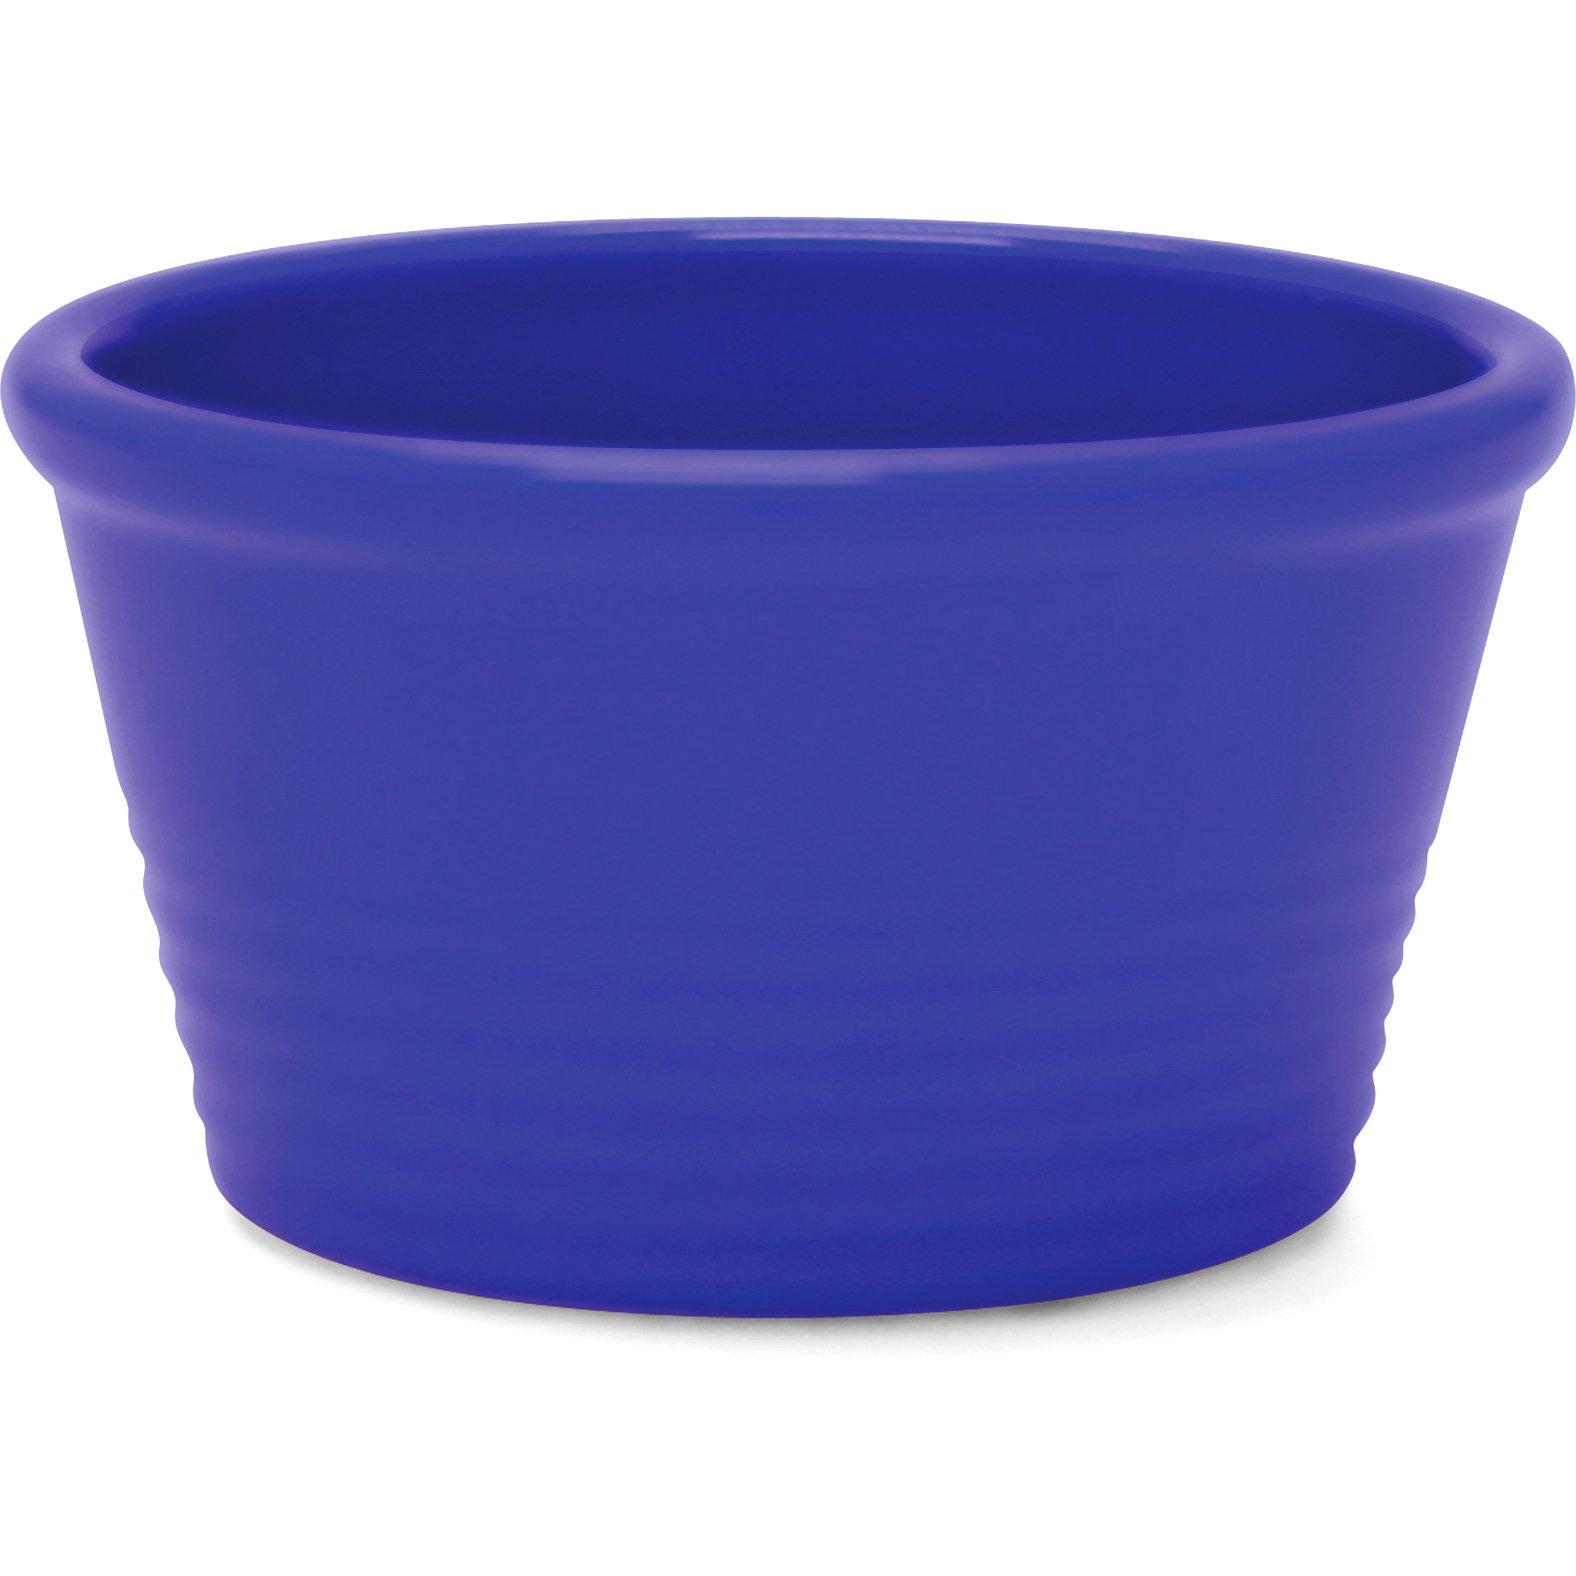 Chantal Indigo Blue Ceramic Stackable Ramekin, Set of 4